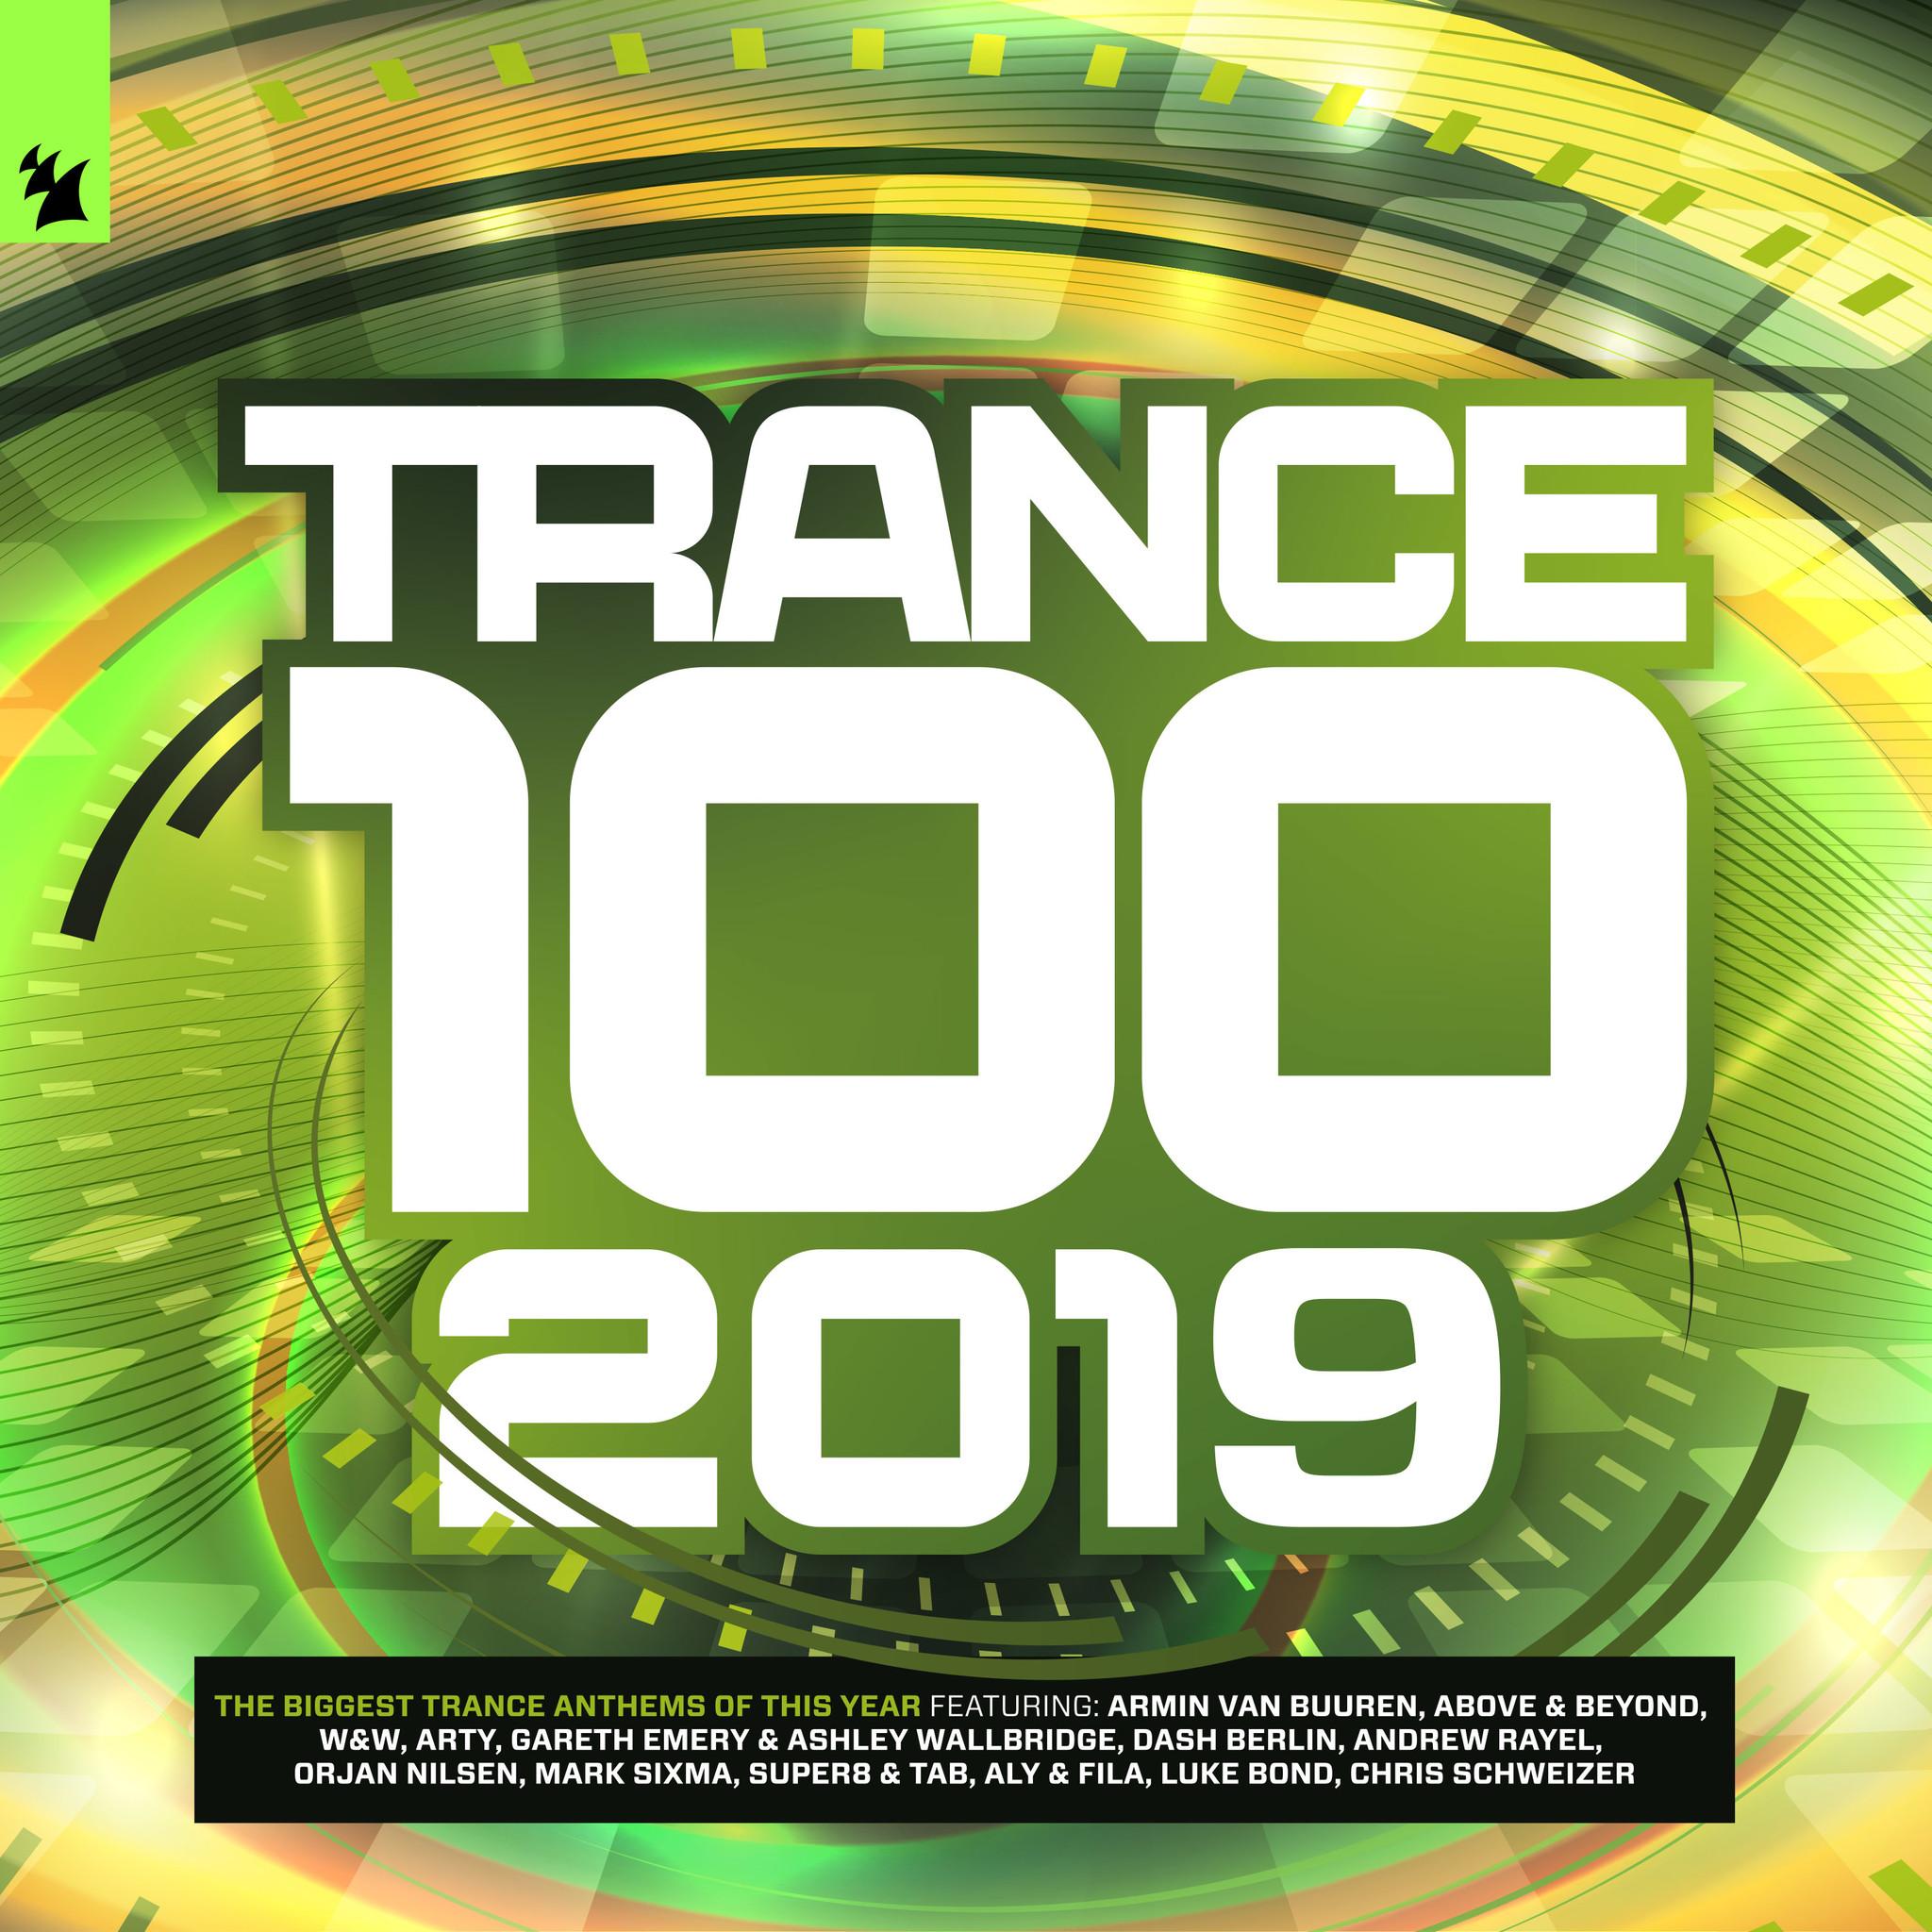 Trance 100  Trance 100 - 2019